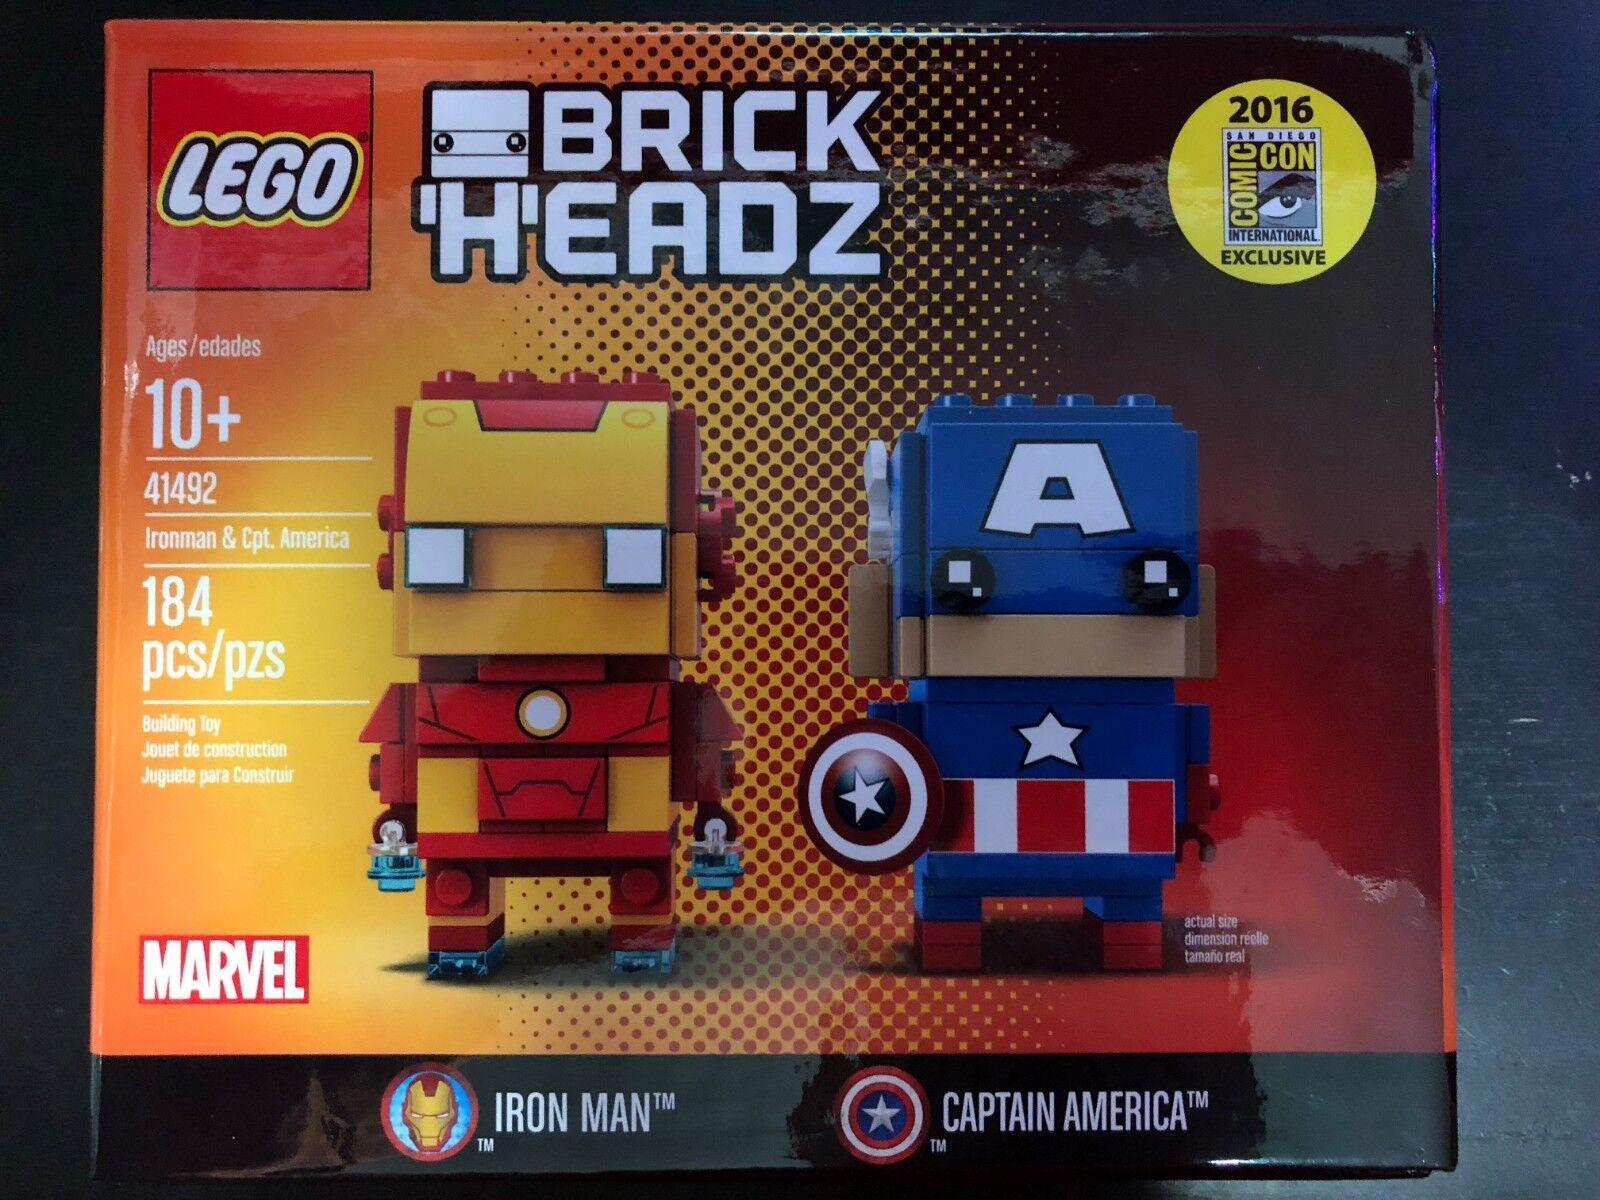 LEGO SDCC 2016 Brick Headz Captain America & Iron Iron Iron Man Exclusive New 41492  colores increíbles